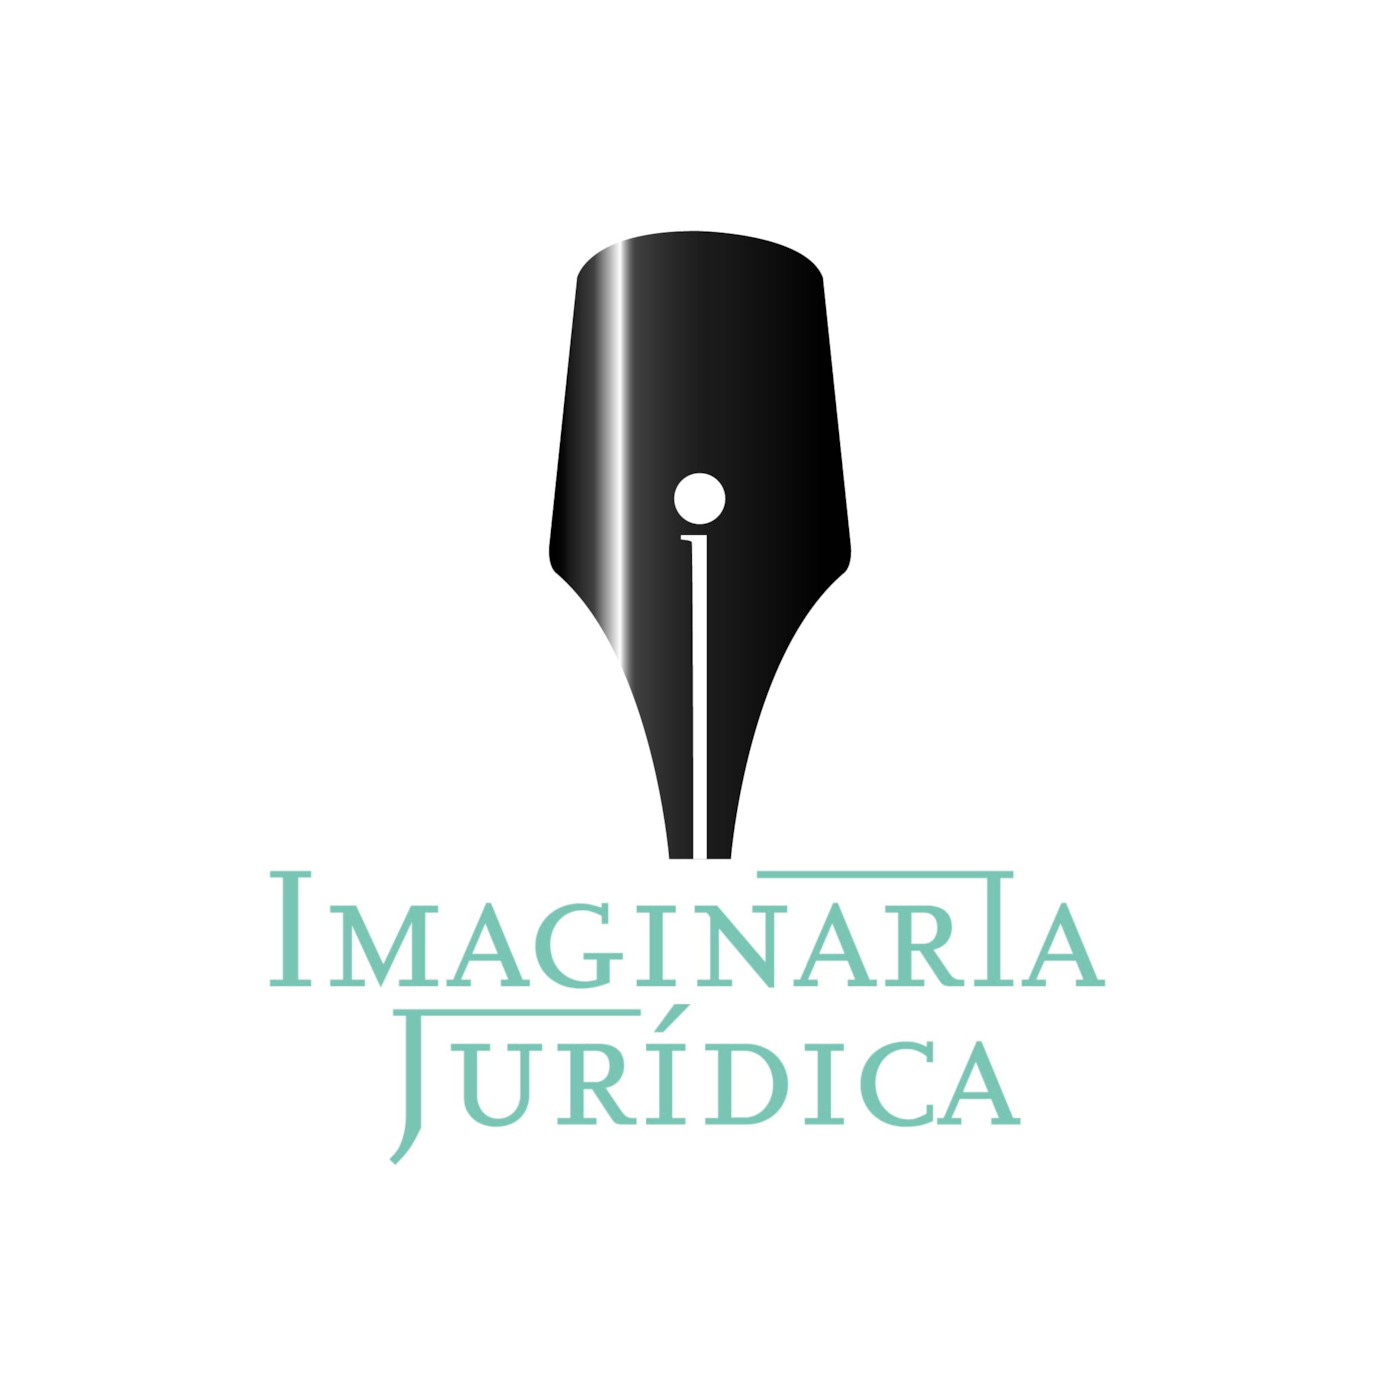 Imaginaria Jurídica